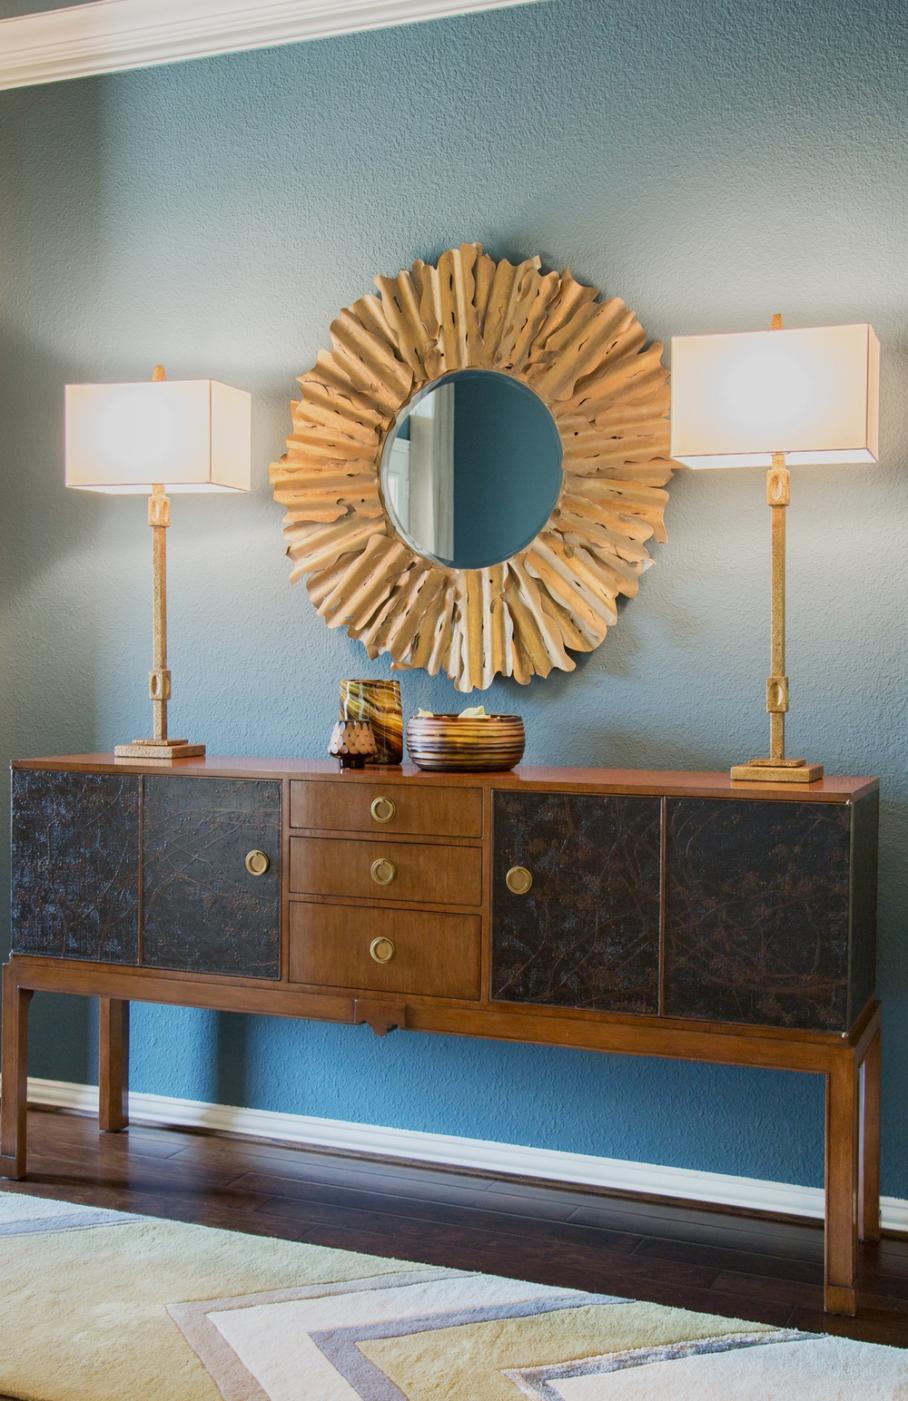 Entry hall remodel; lamp; mirror; rug; decor | Interior Designer: Carla Aston / Photographer: Tori Aston